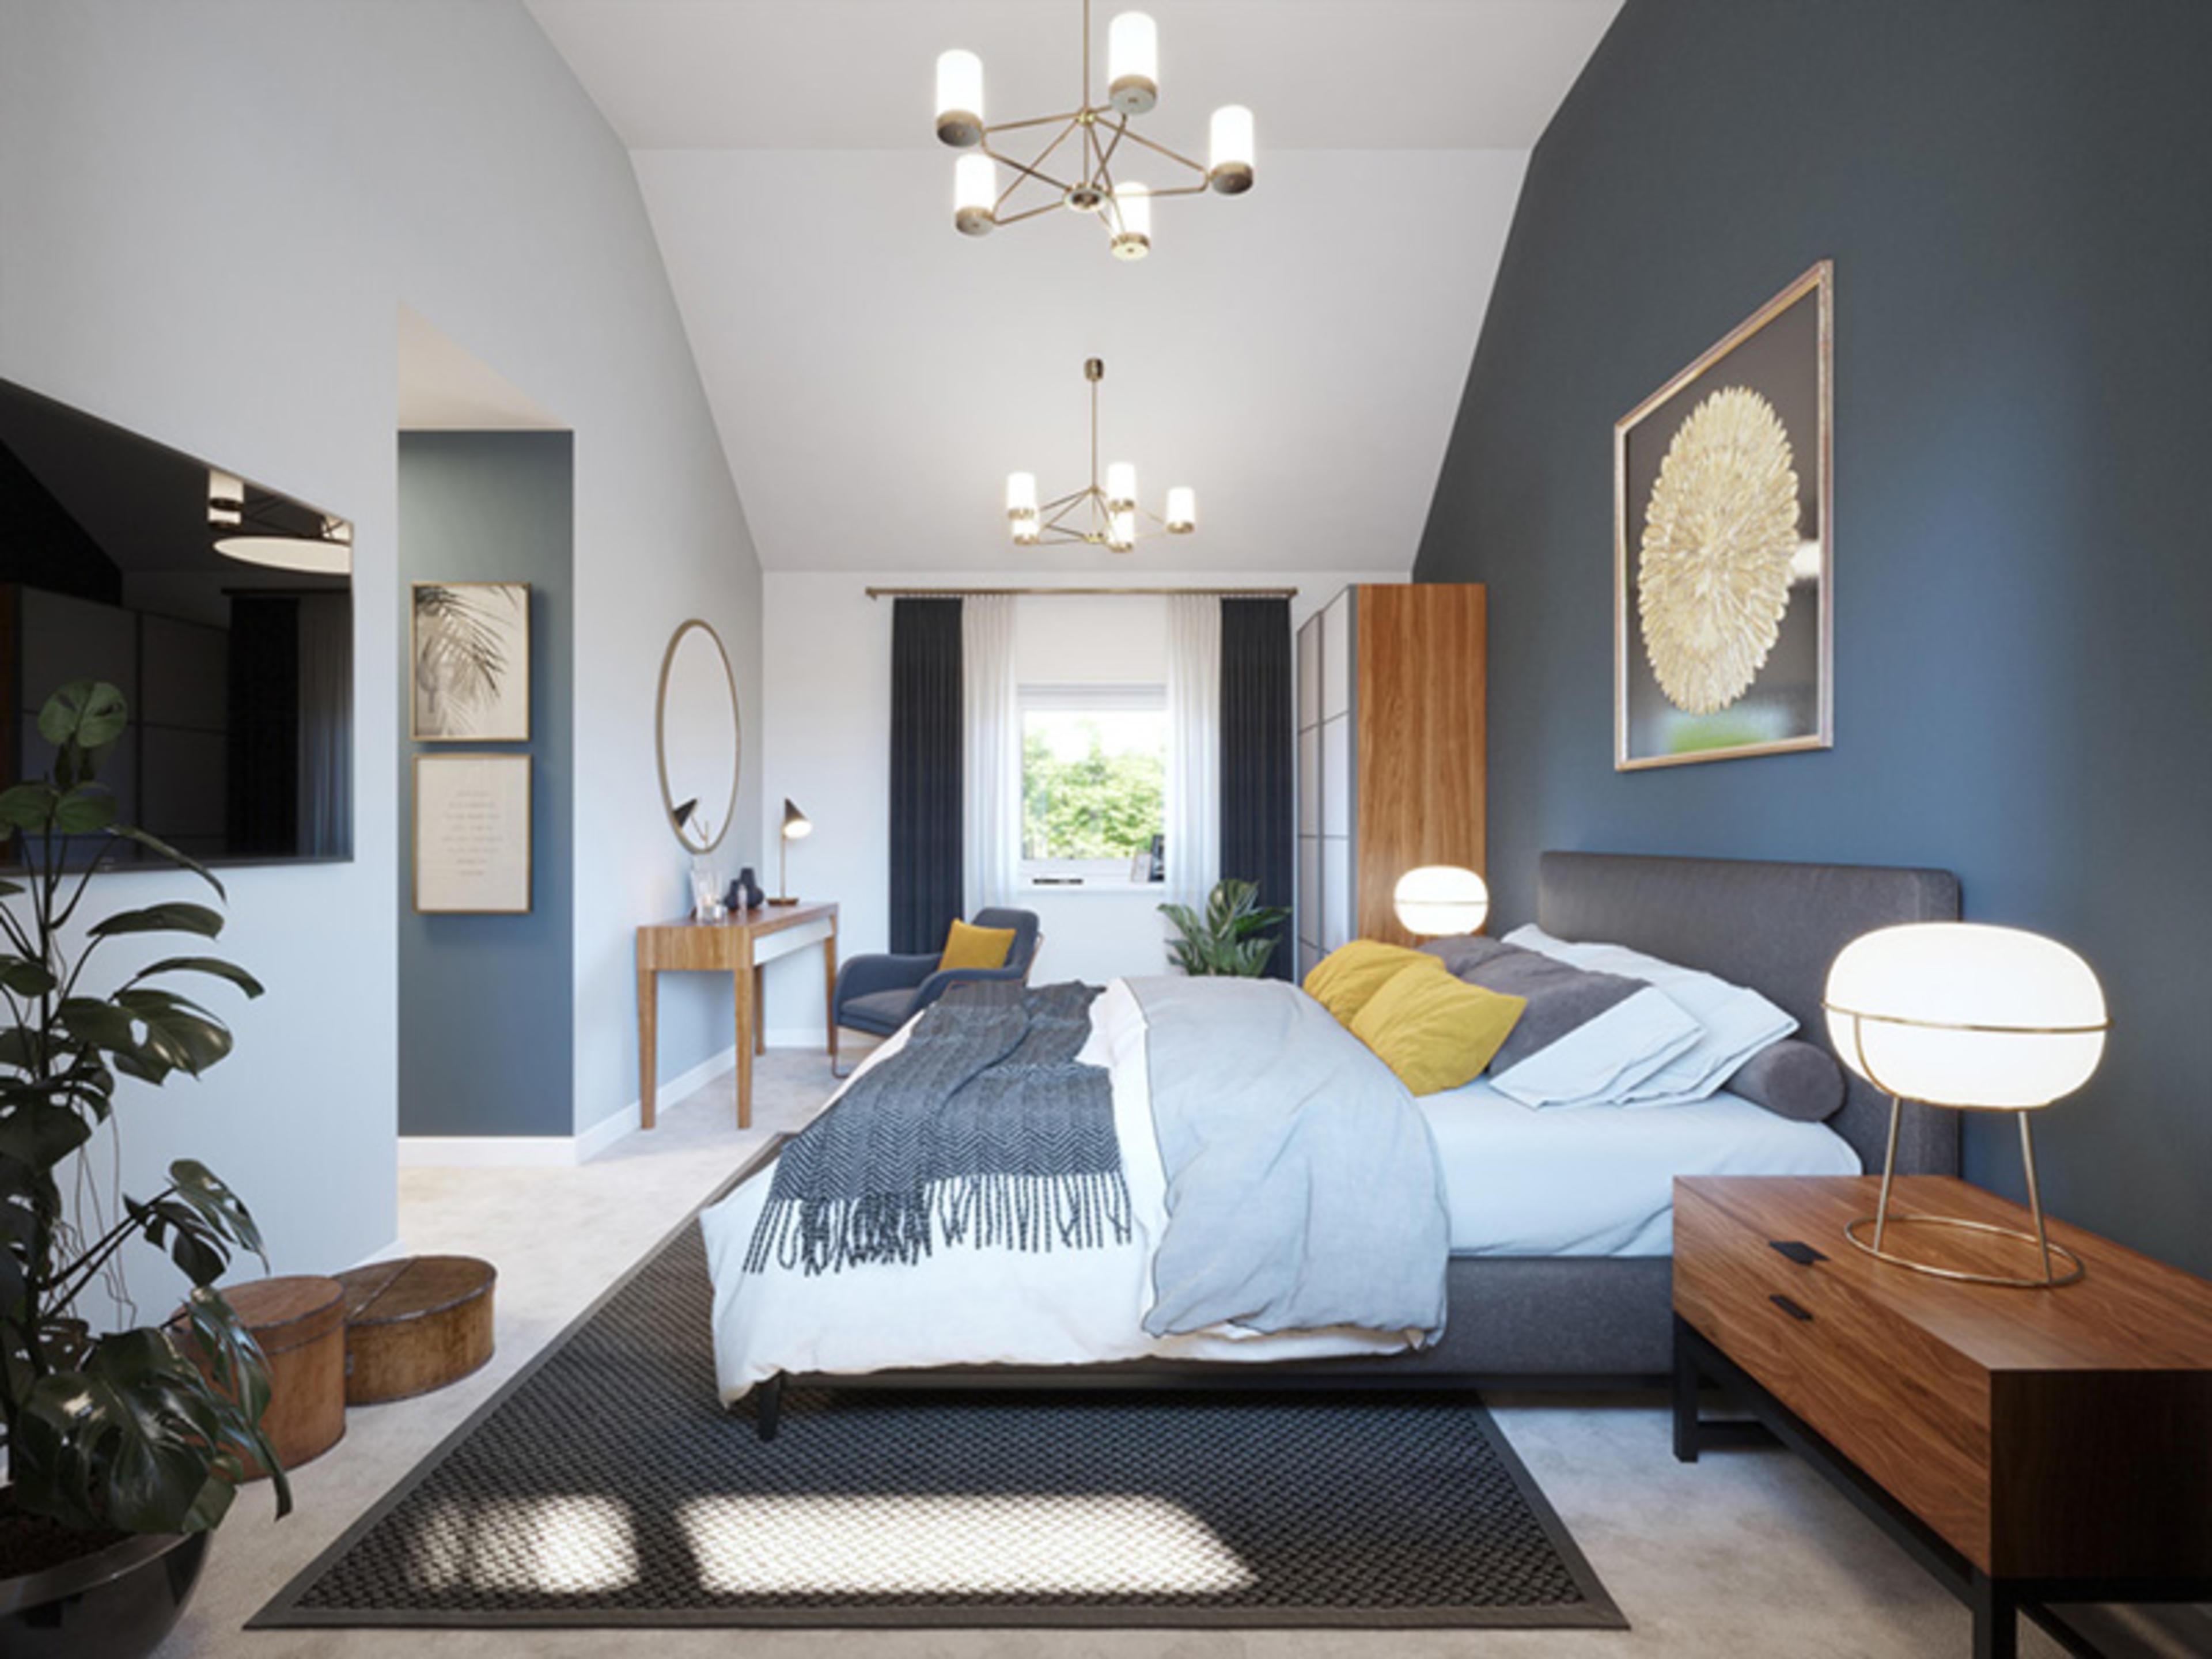 watling-grange-harrogate-kirkstead-type-q-bedroom-cgi